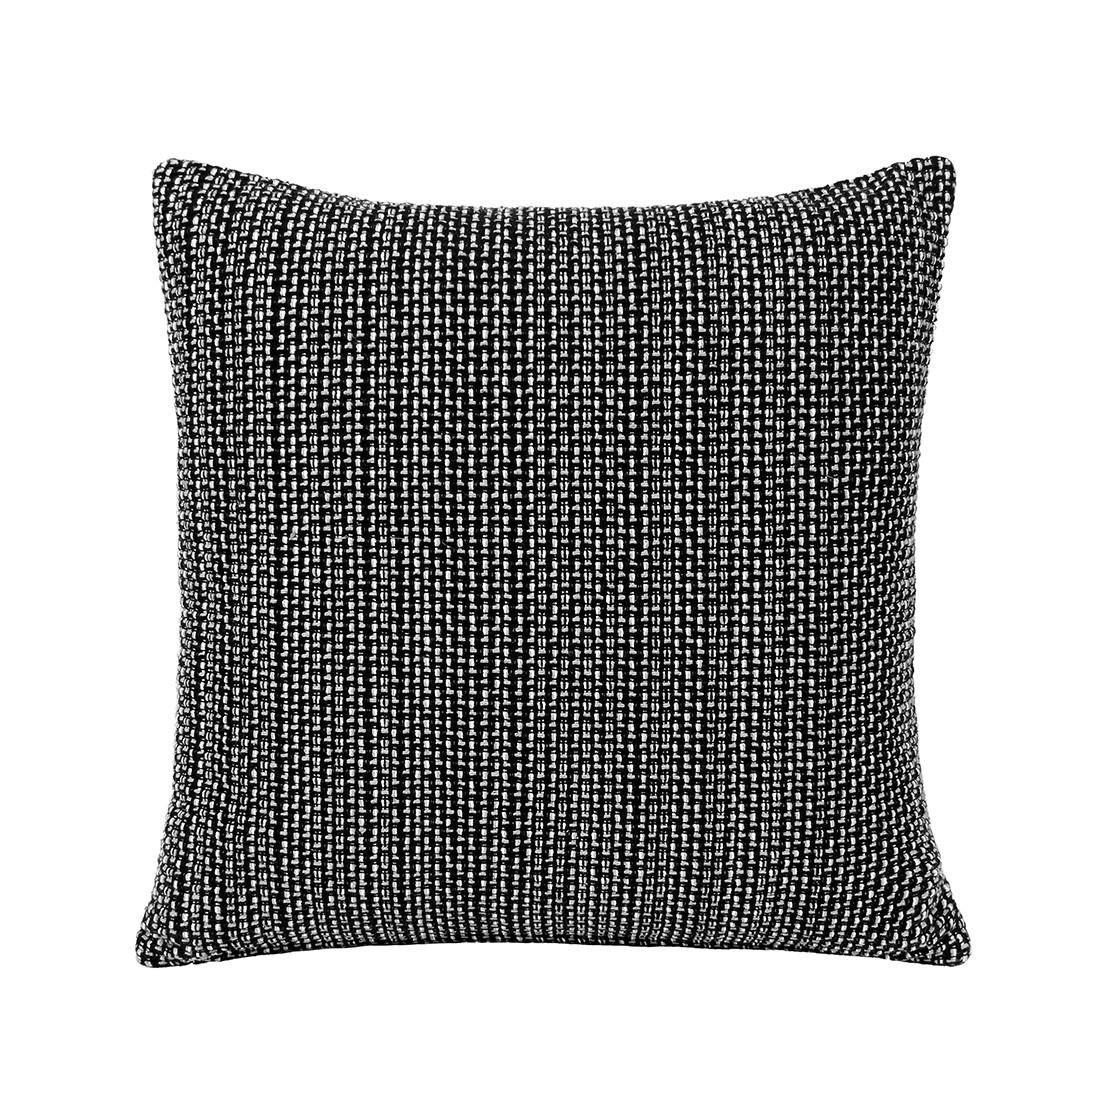 Black Weave Cushion